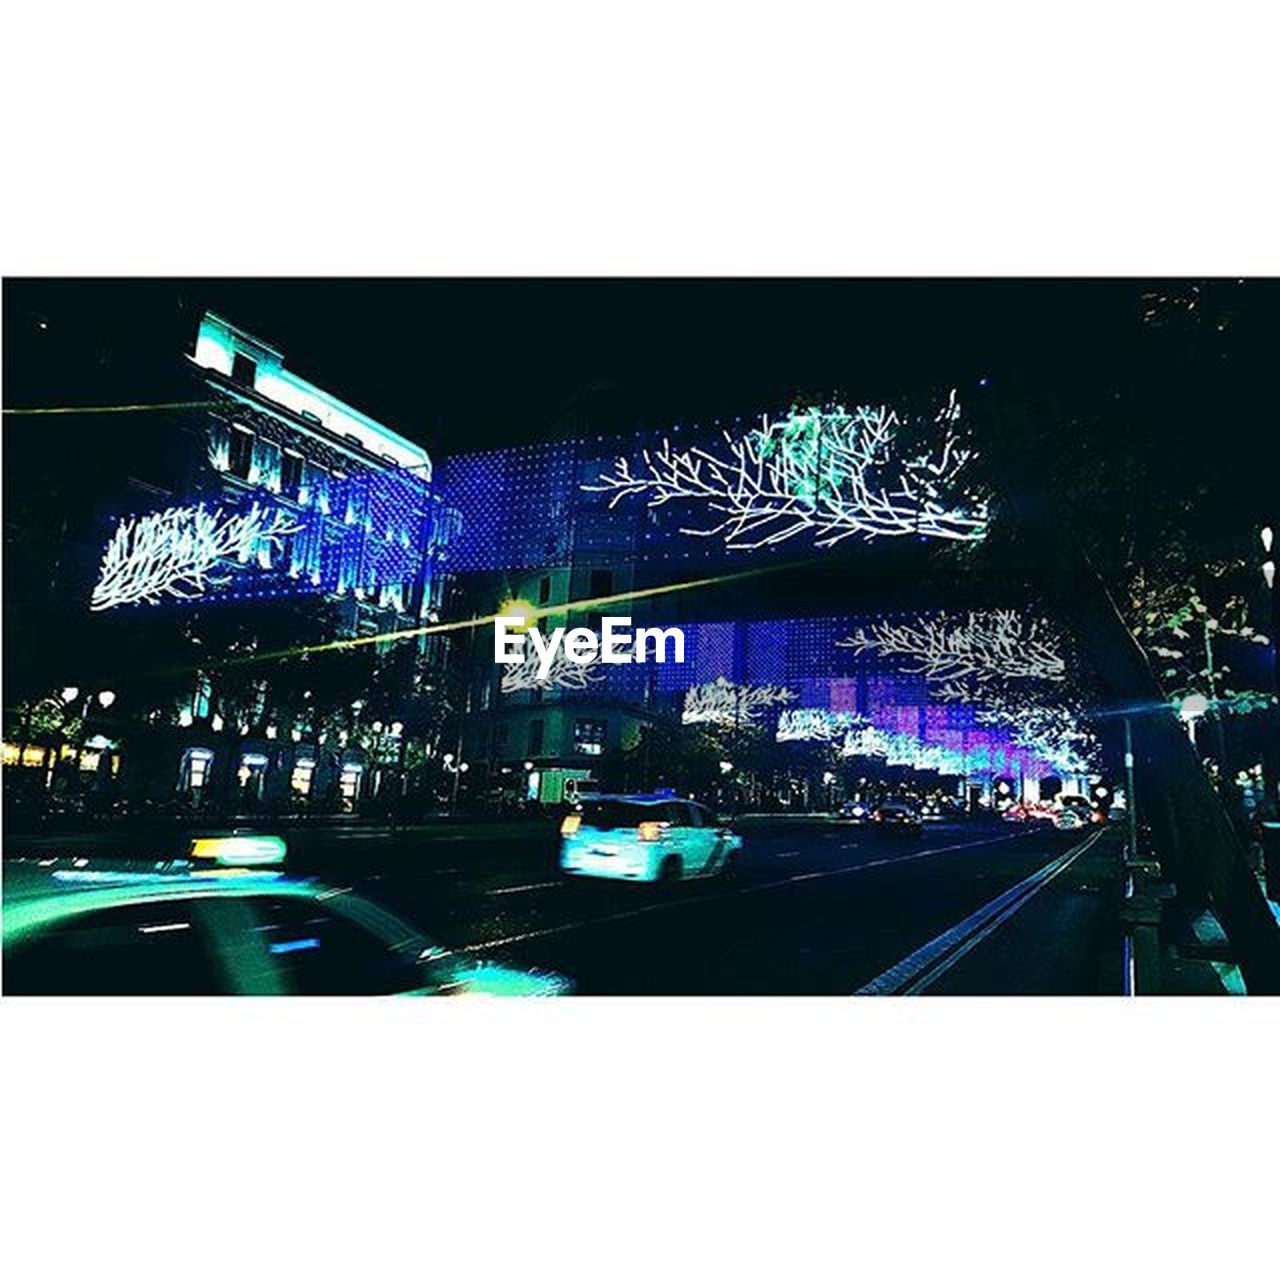 illuminated, night, car, outdoors, architecture, no people, city